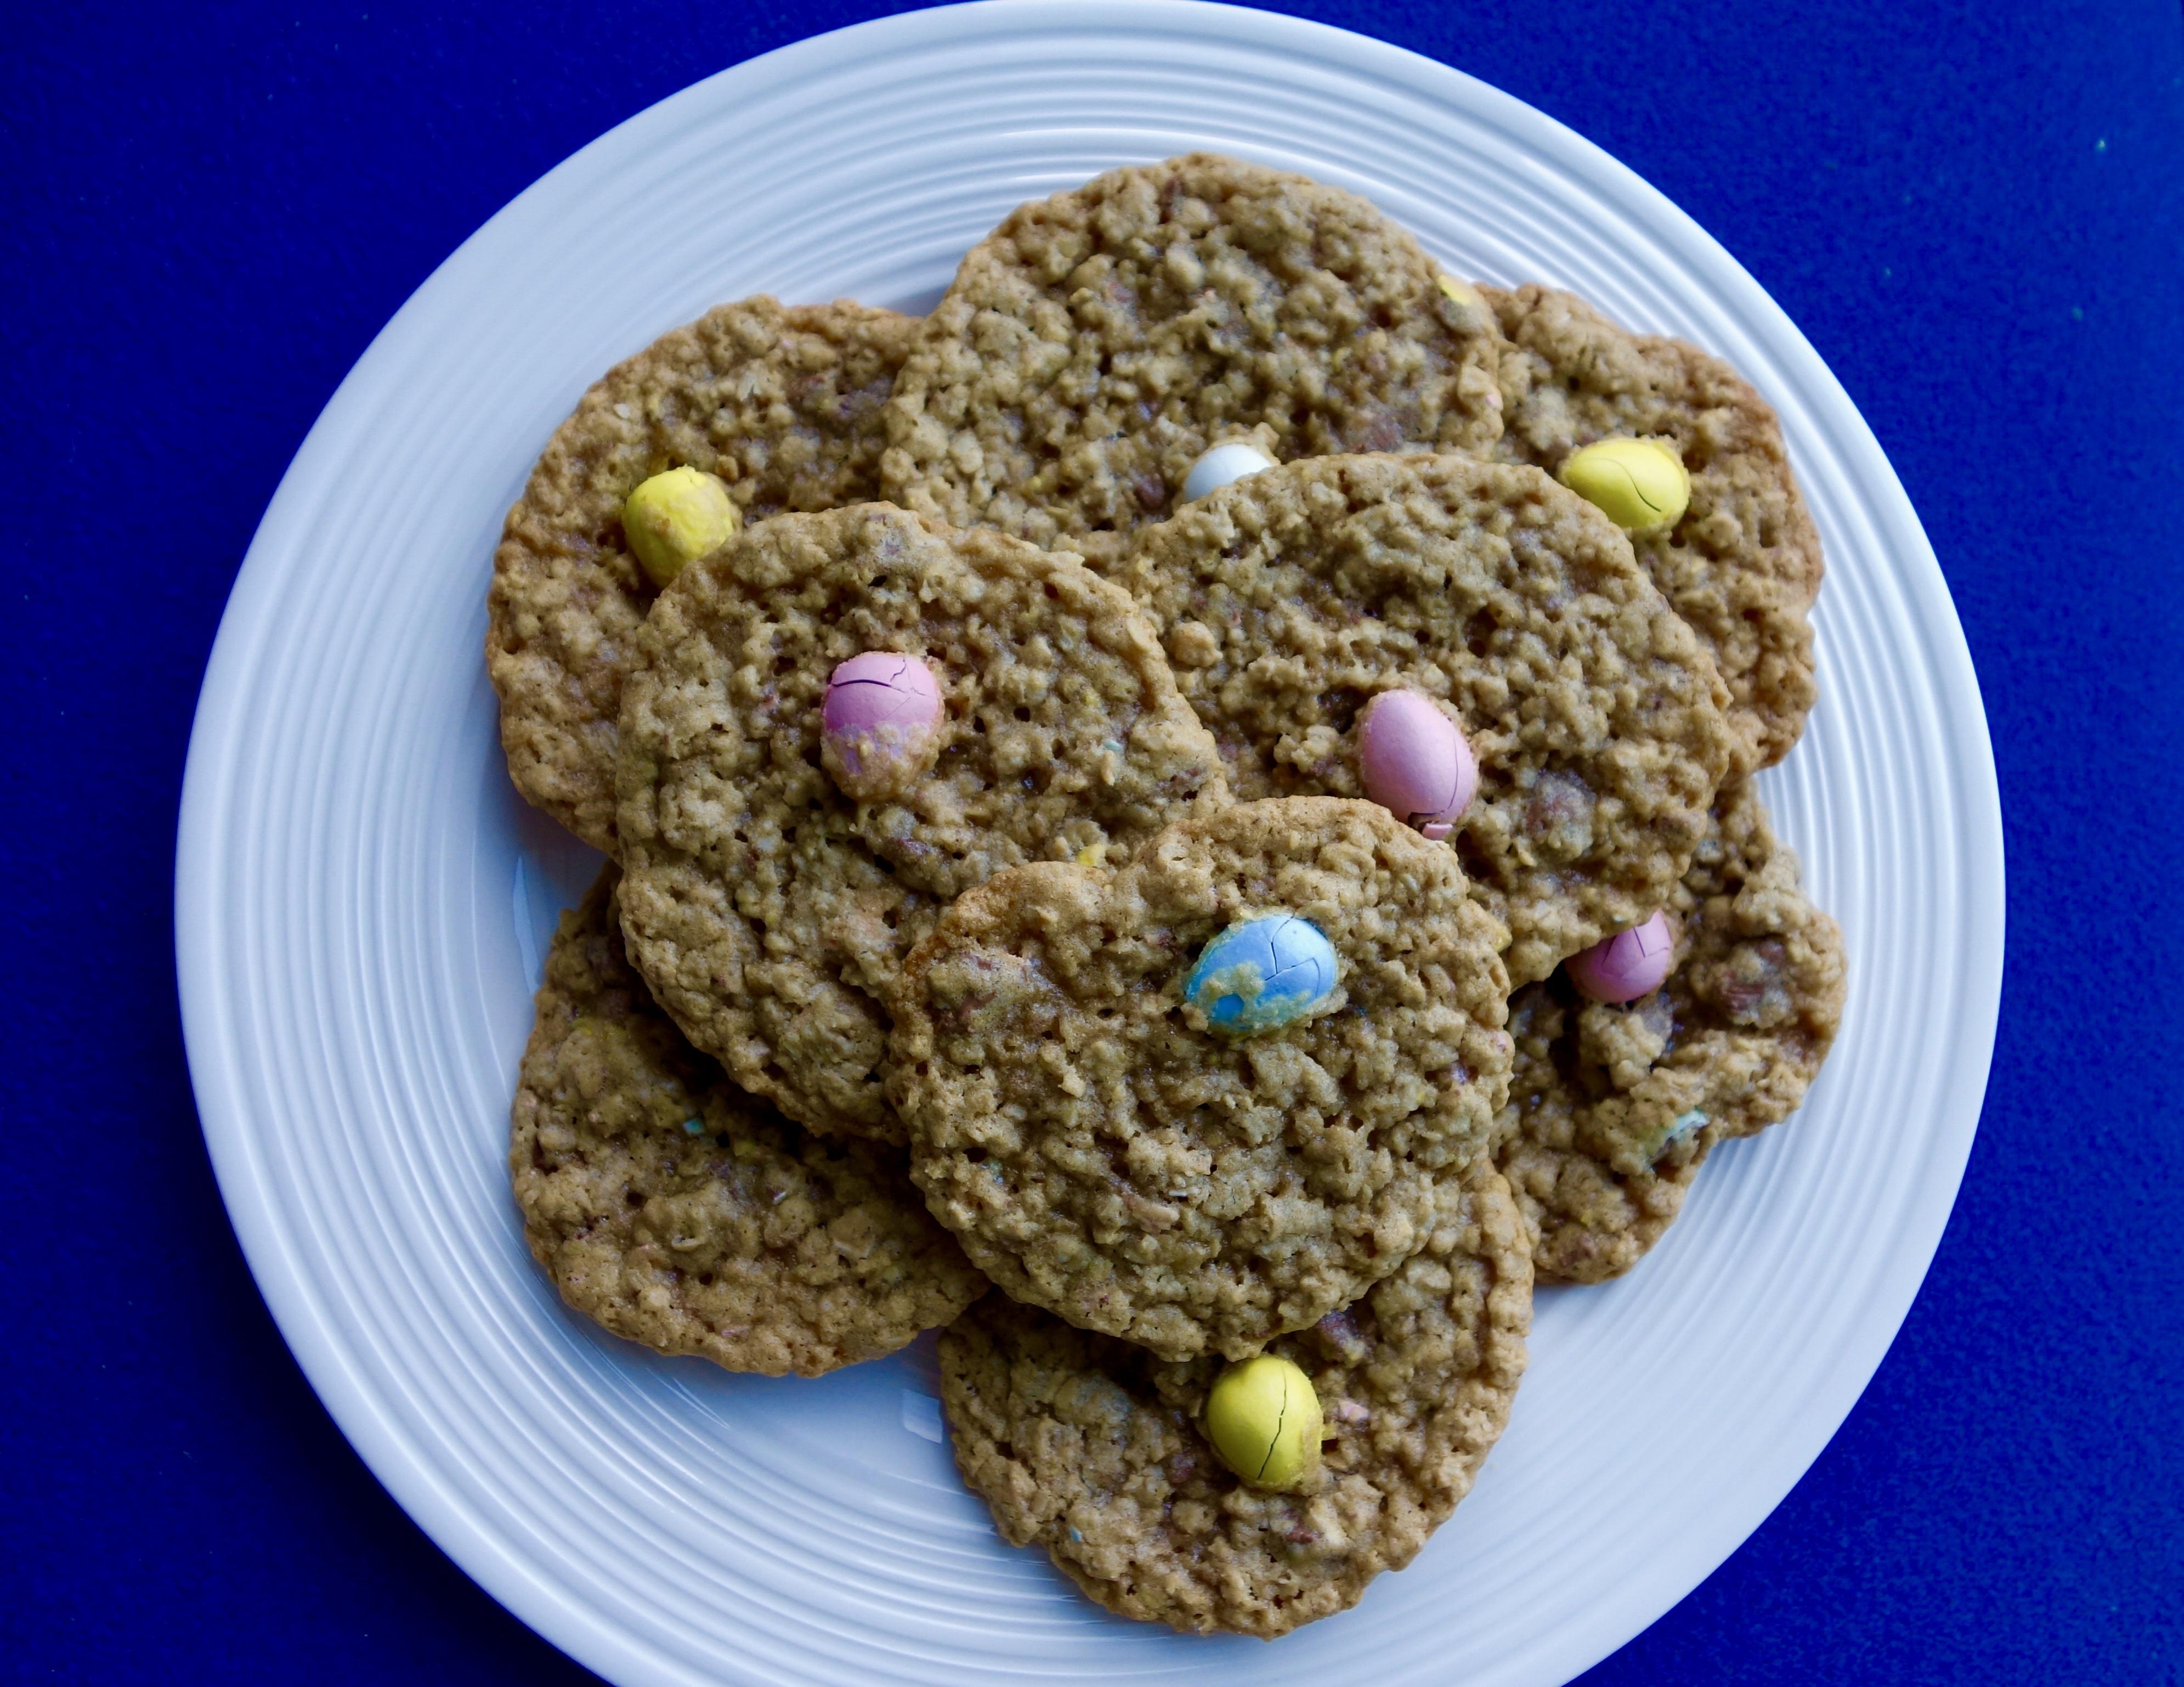 Chipits skor toffee bits cookie recipe